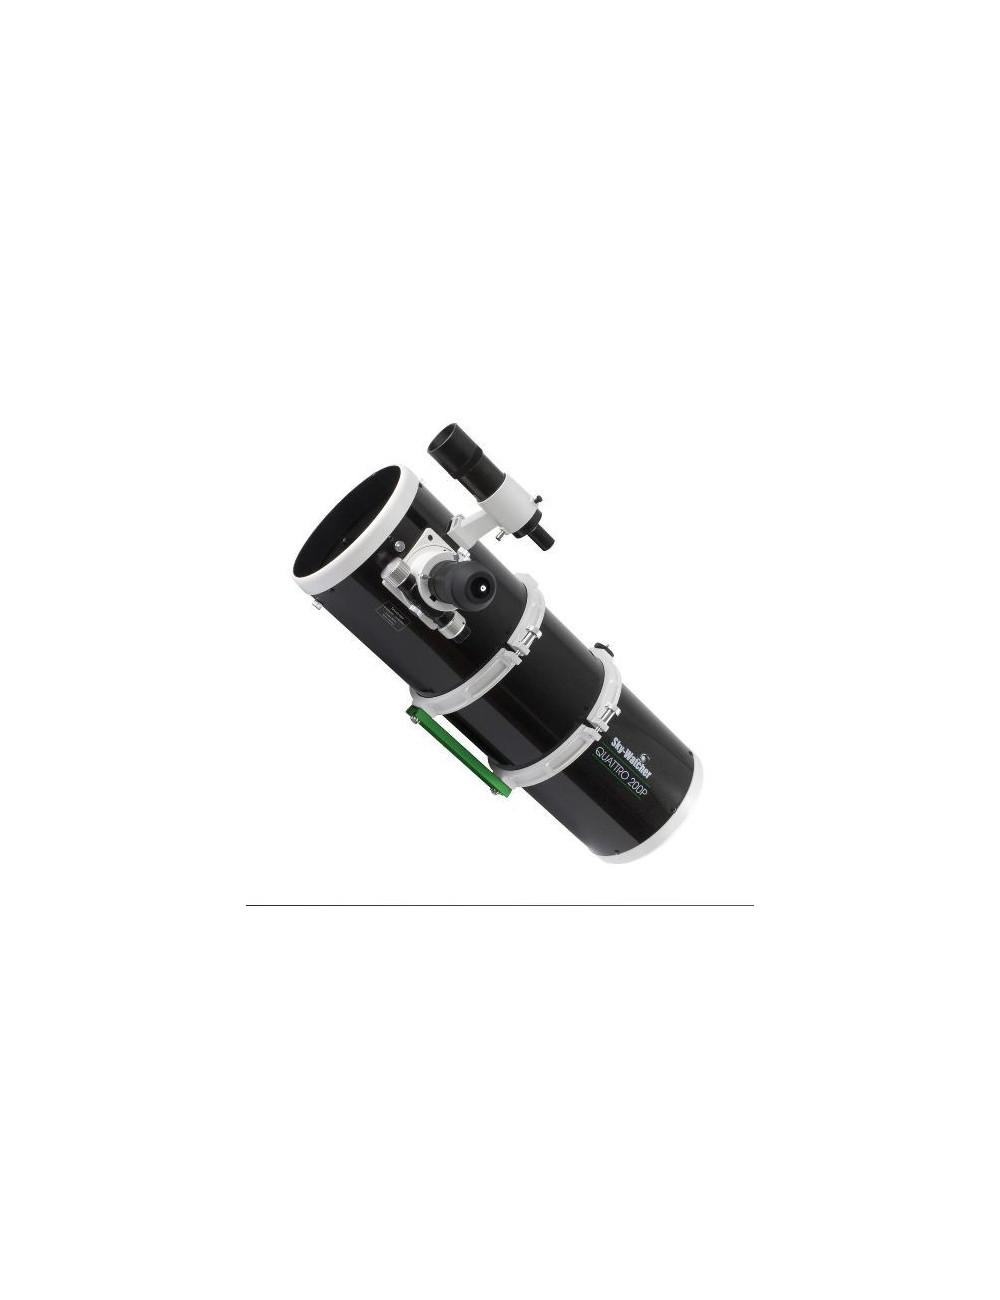 Tube optique Newton 200/800 Sky-Watcher Black Diamond Dual Speed